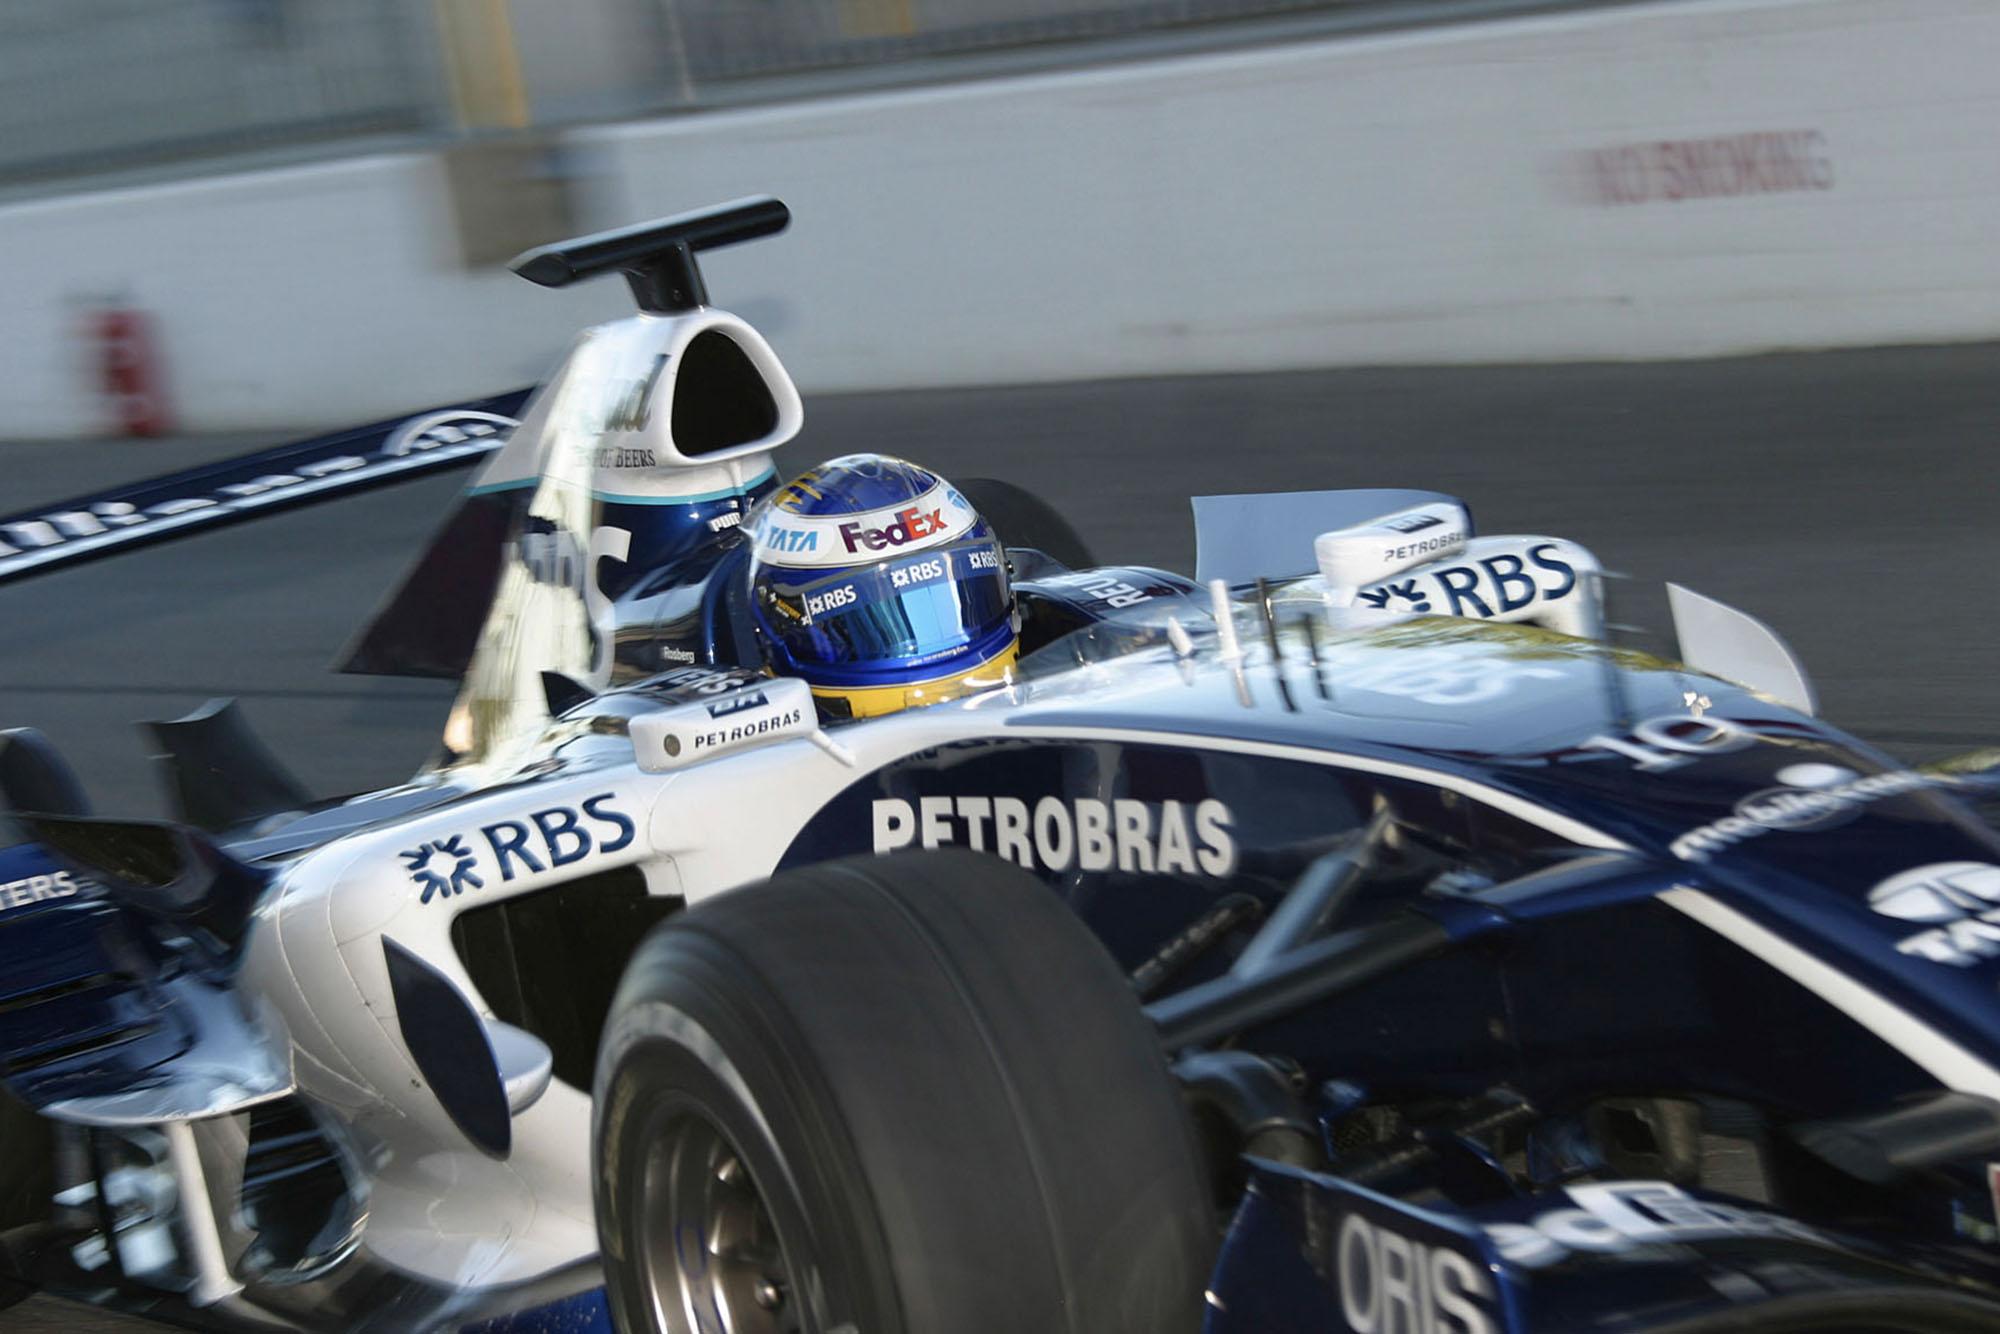 Nico Rosberg Williams 2006 Bahrain Grand Prix